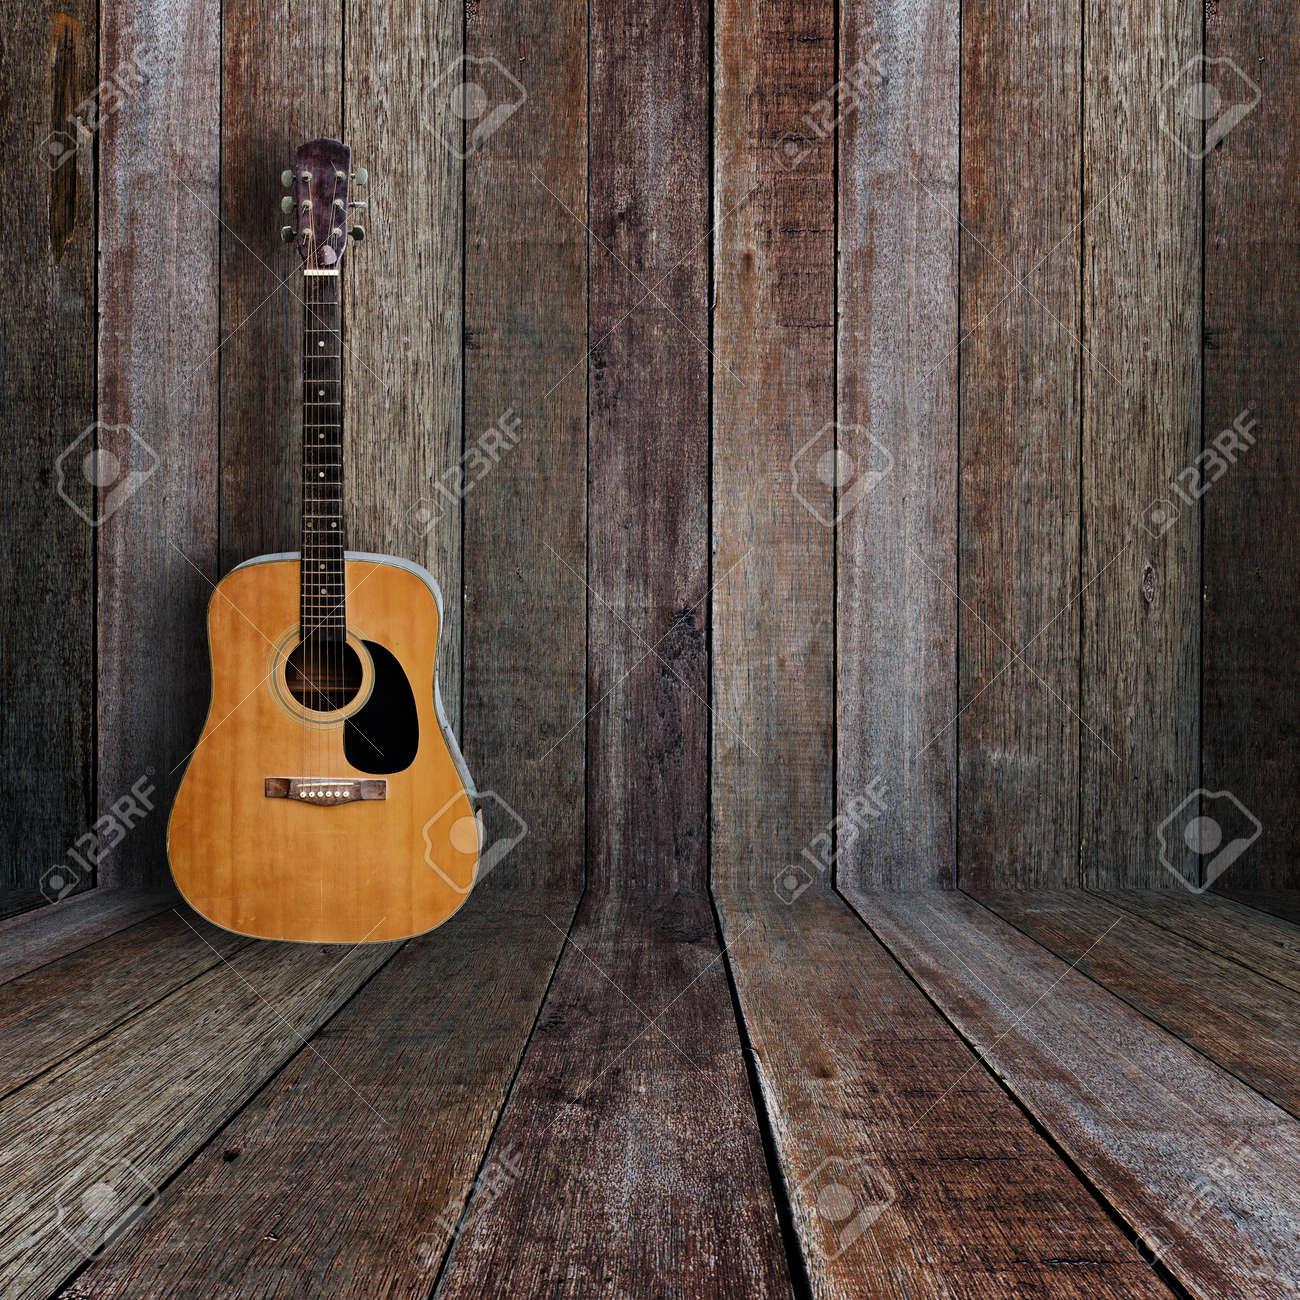 Guitar In Vintage Wood Room Stock Photo